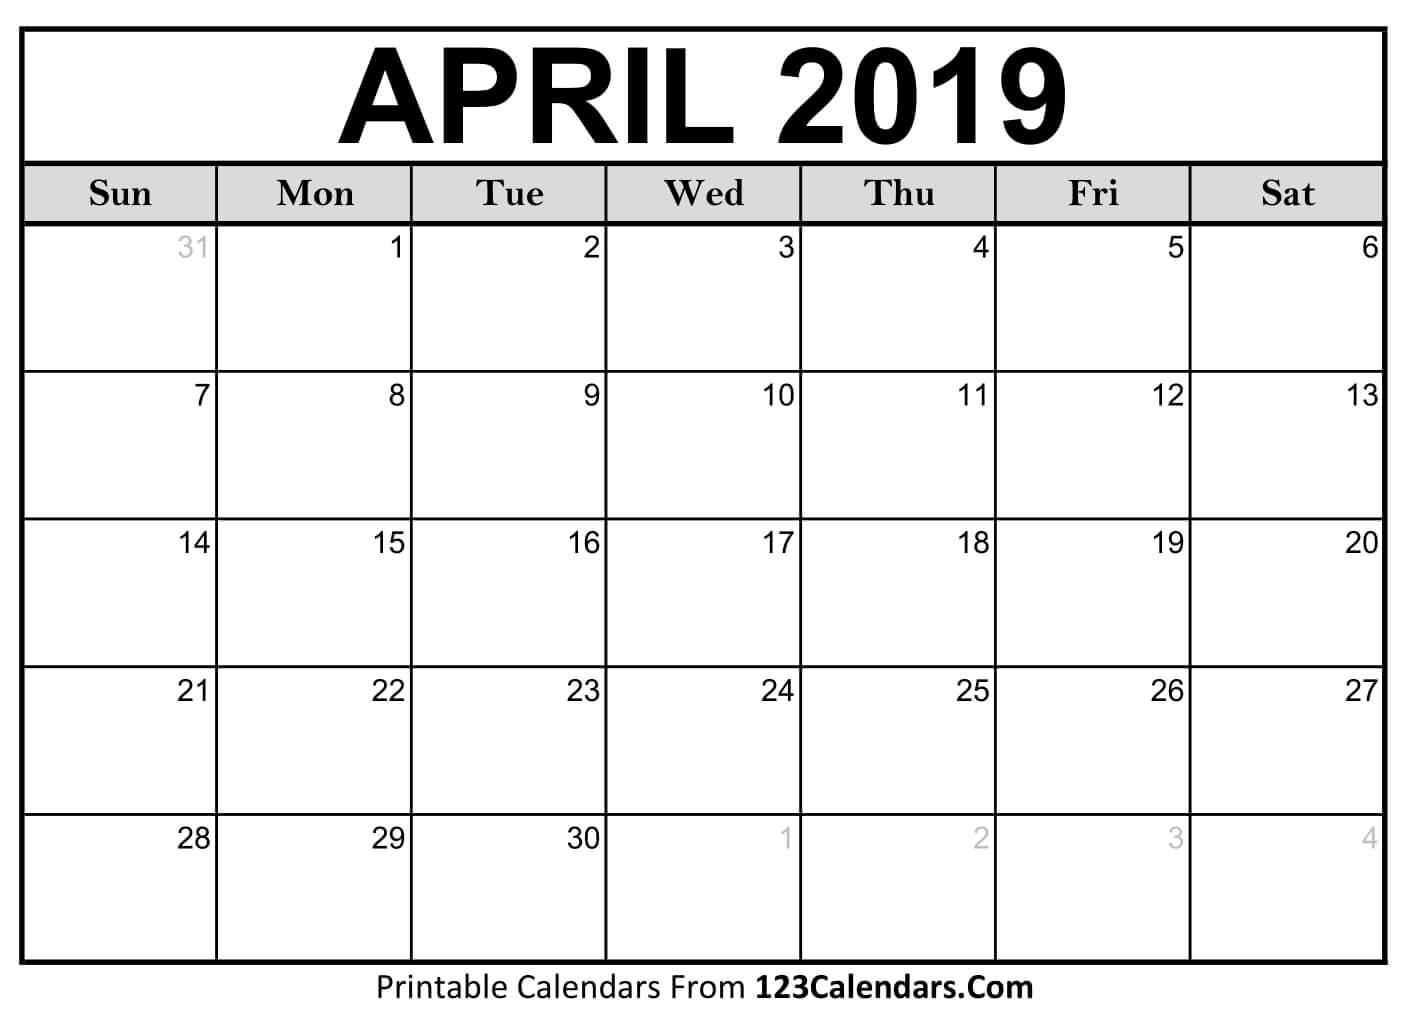 April 2019 Calendar PDF